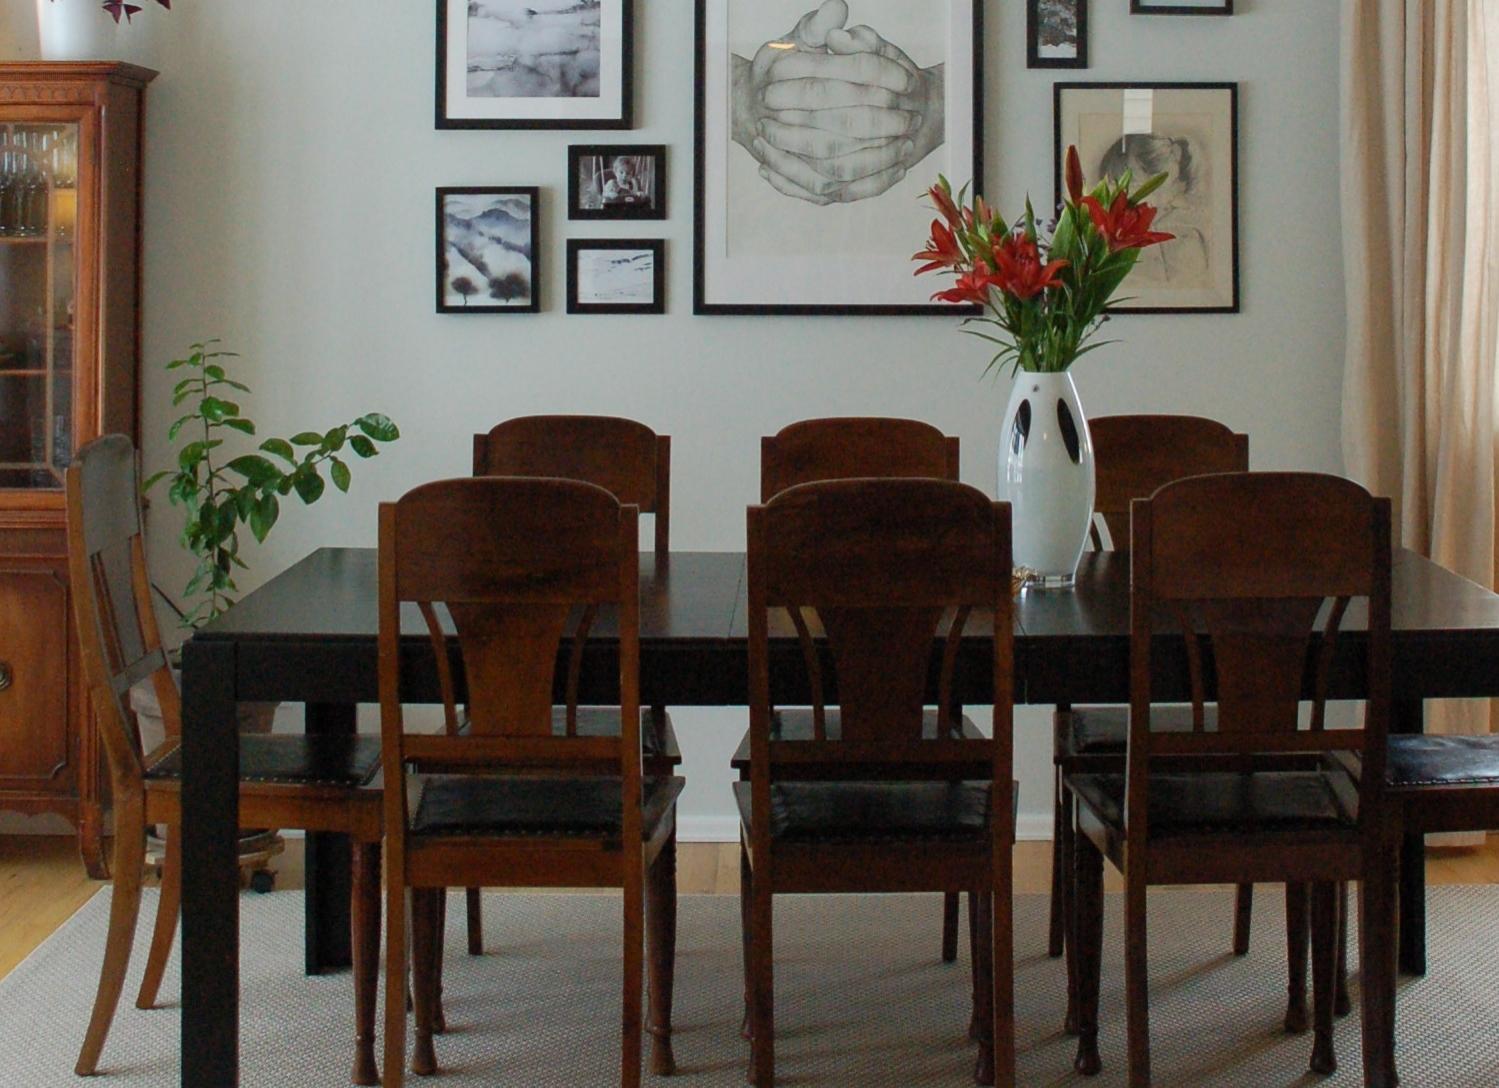 Dining room makeover at Scandimericanlife.com